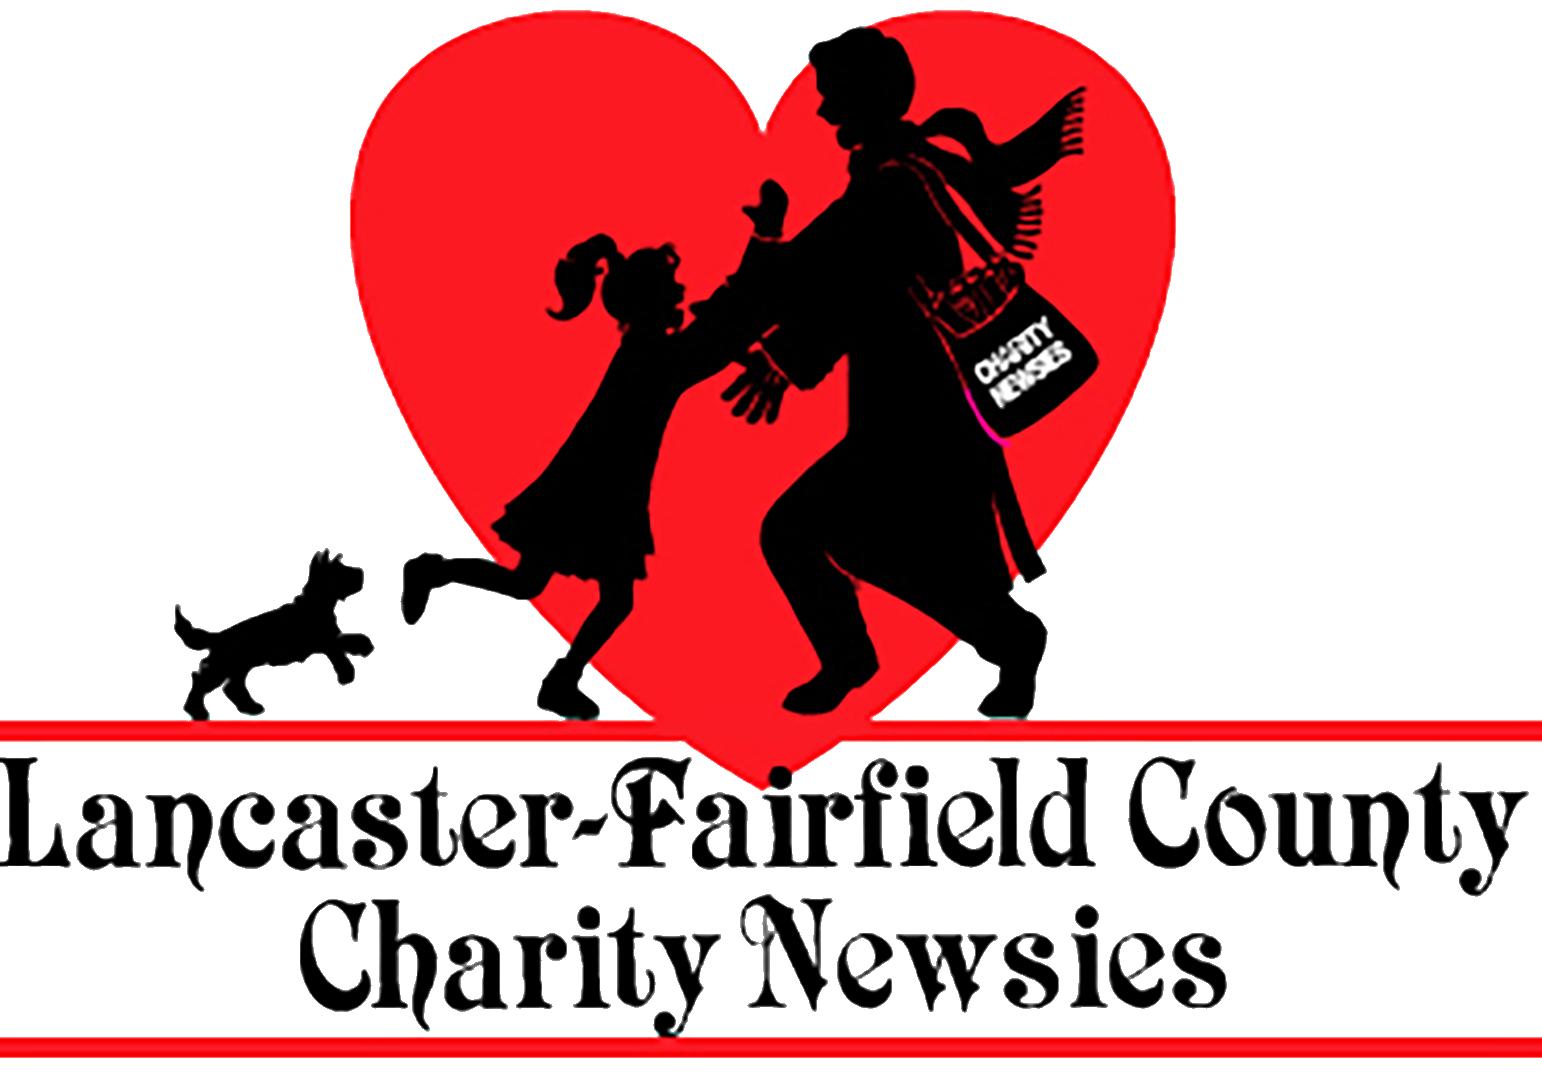 Charity-Newsies.png